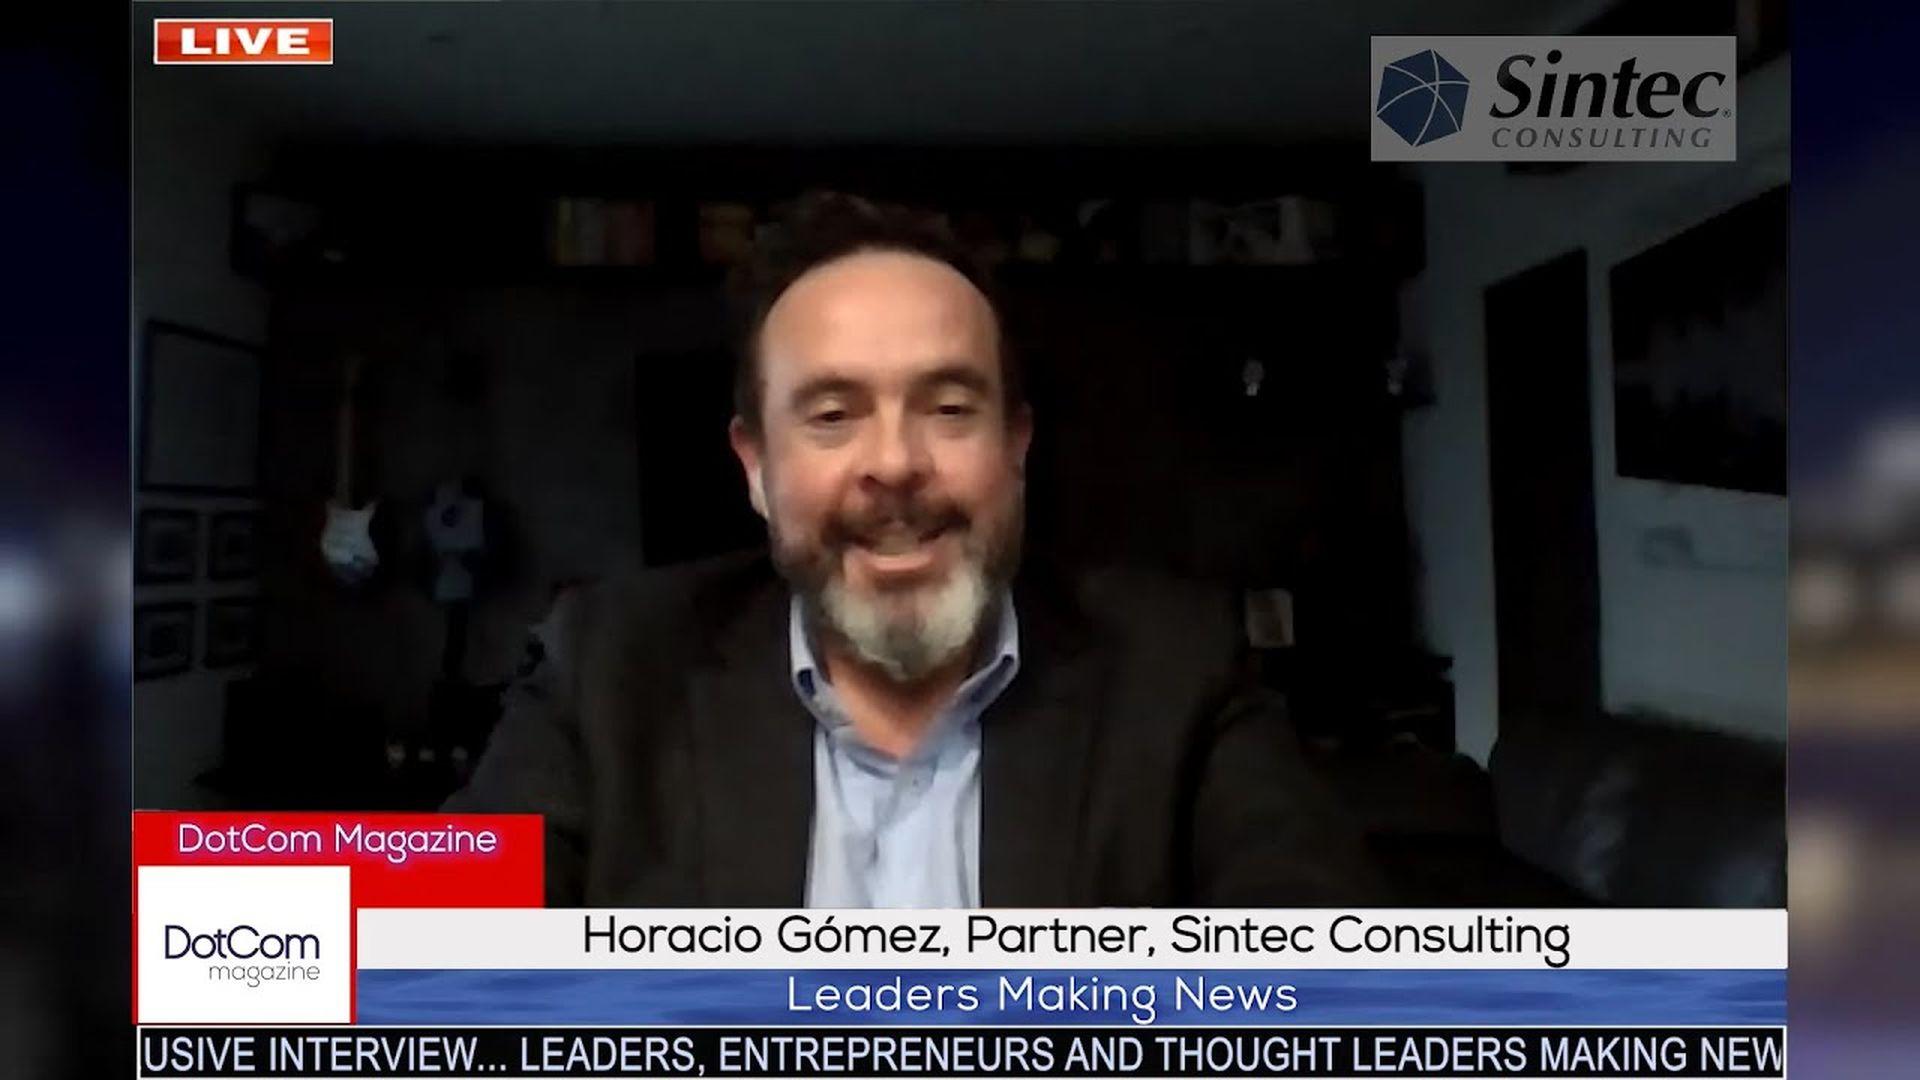 Horacio Gómez, Managing Partner, Sintec, A DotCom Magazine Exclusive Interview